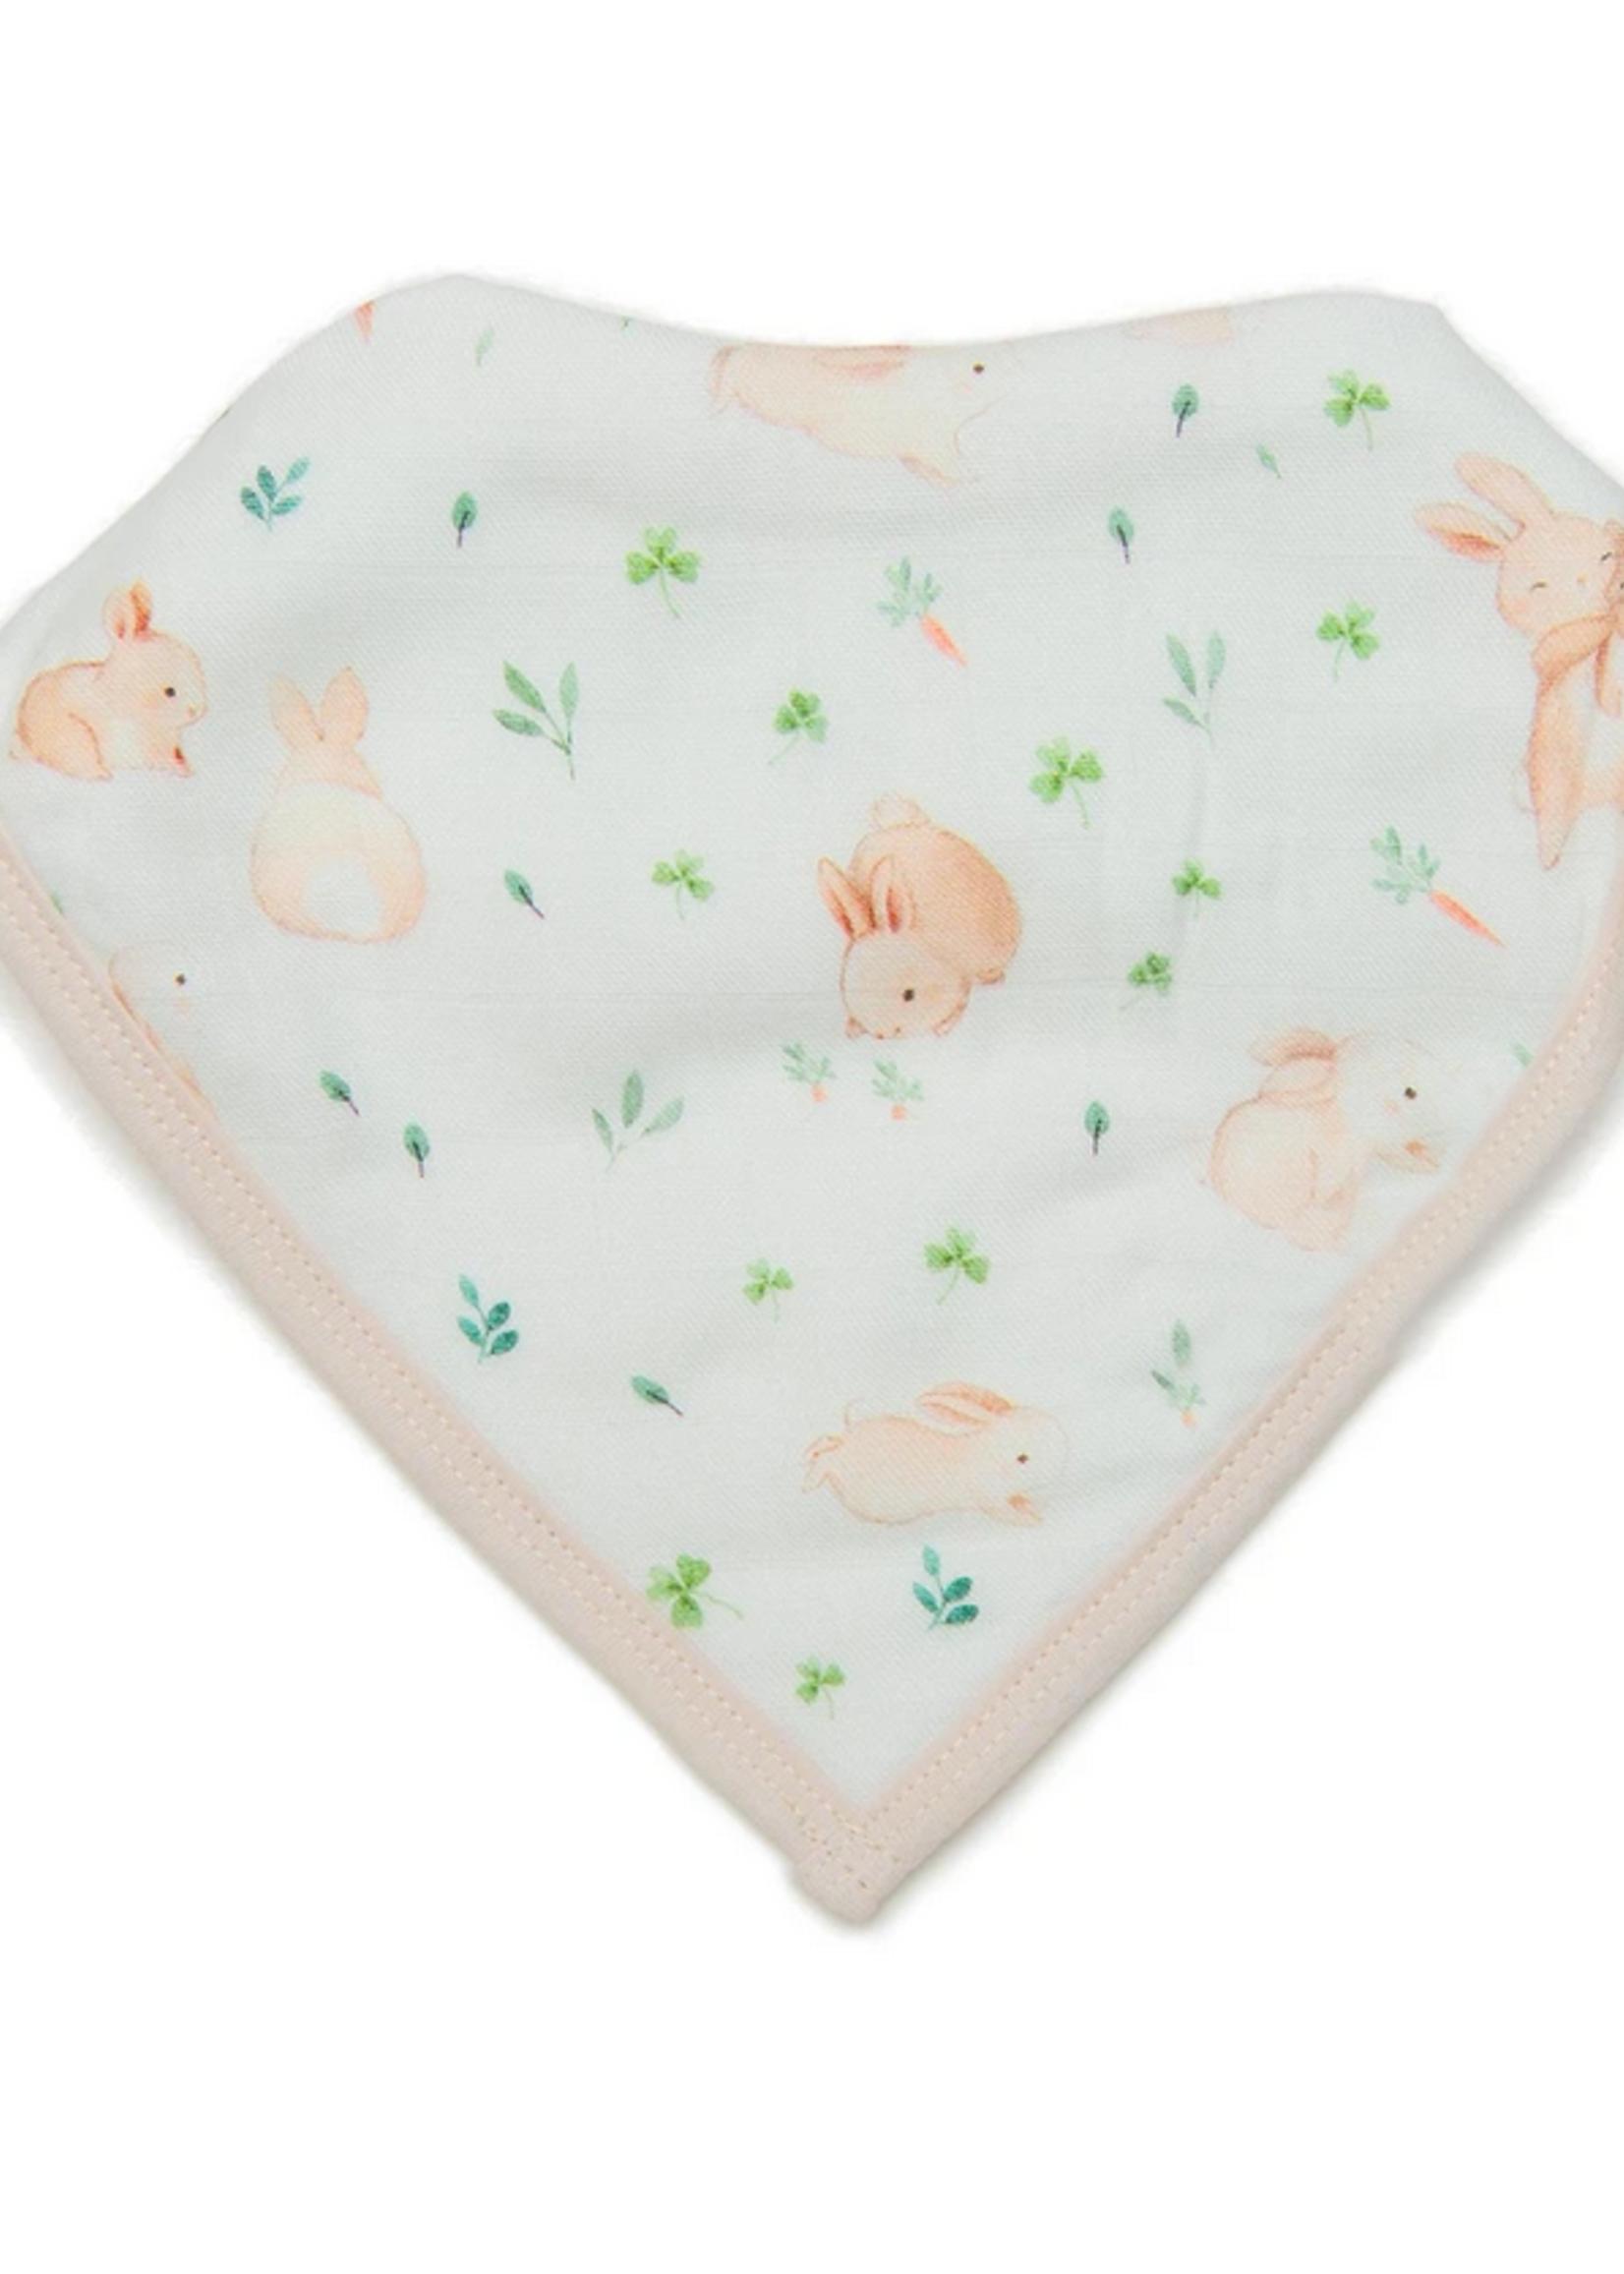 Elitaire Petite Bandana Bib Set - Bunny Meadow